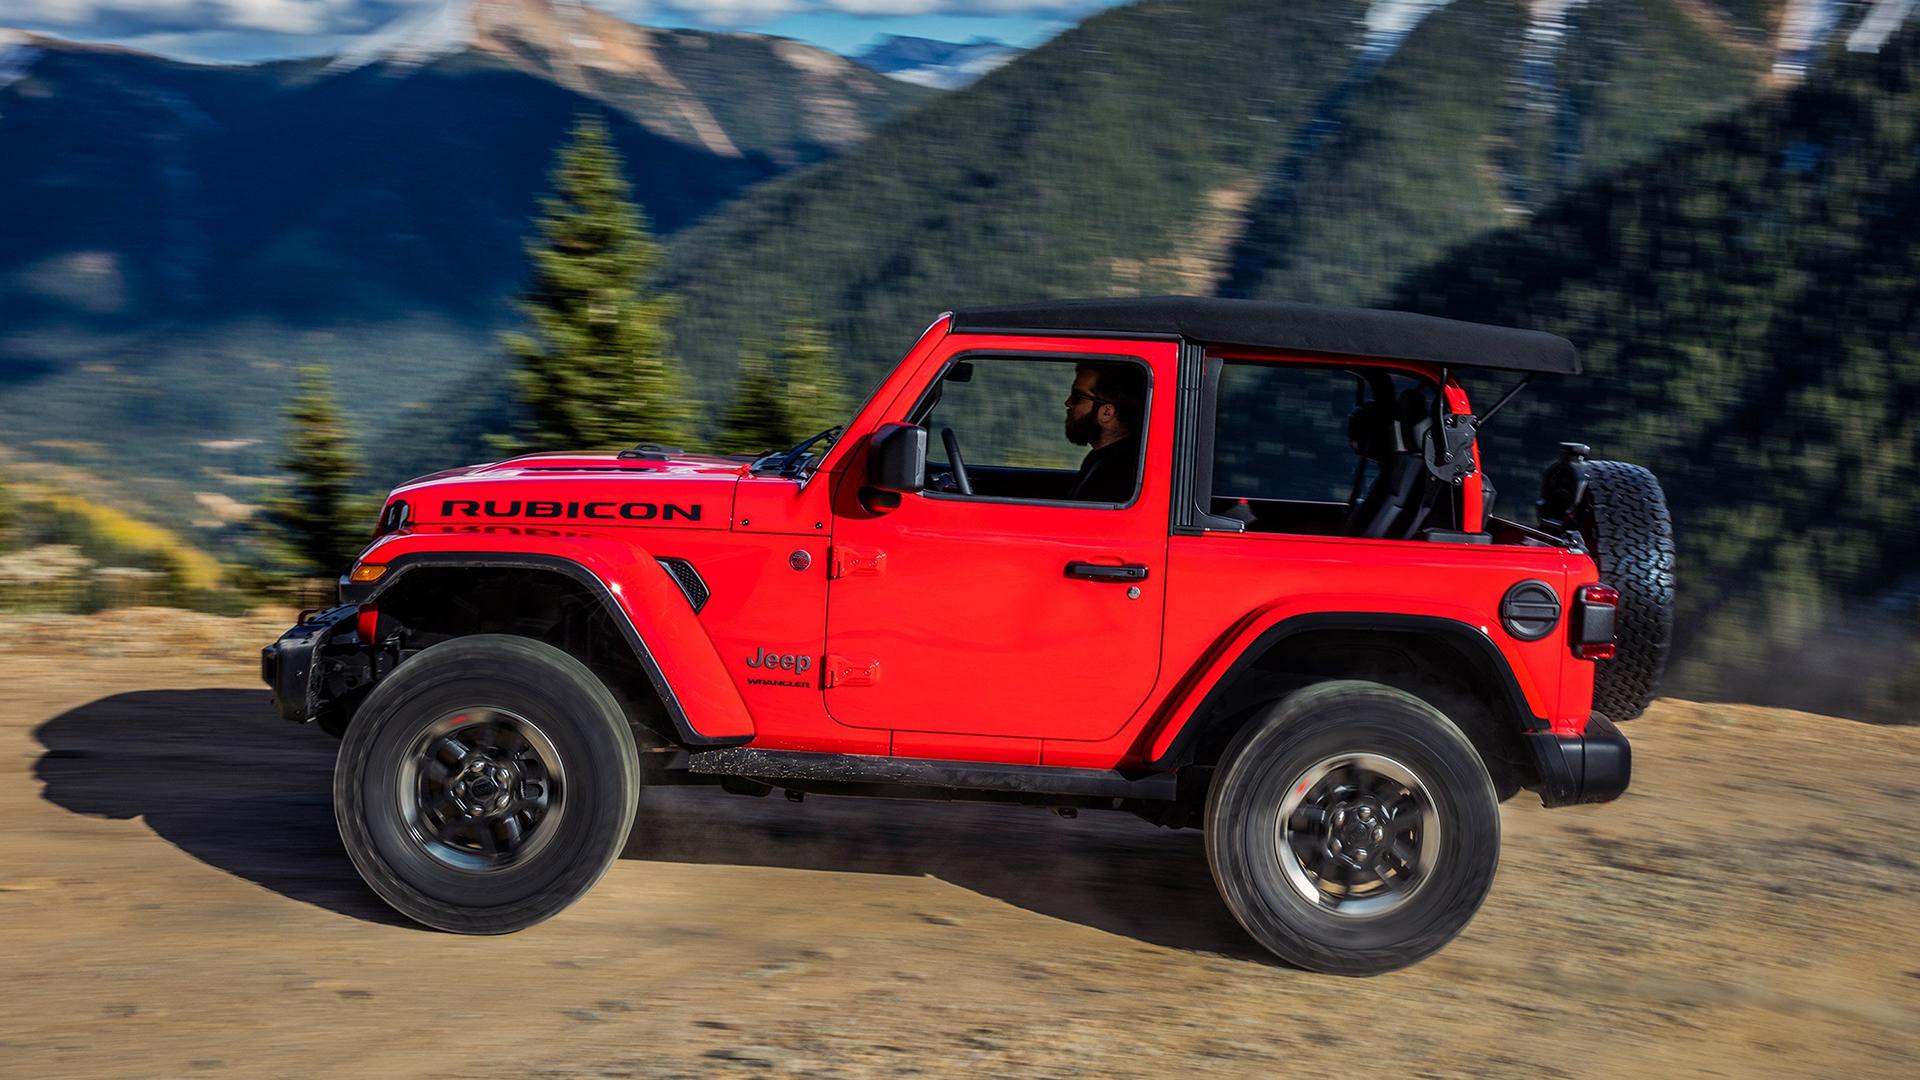 Jeep Wrangler 2018-159532.jpg96442912